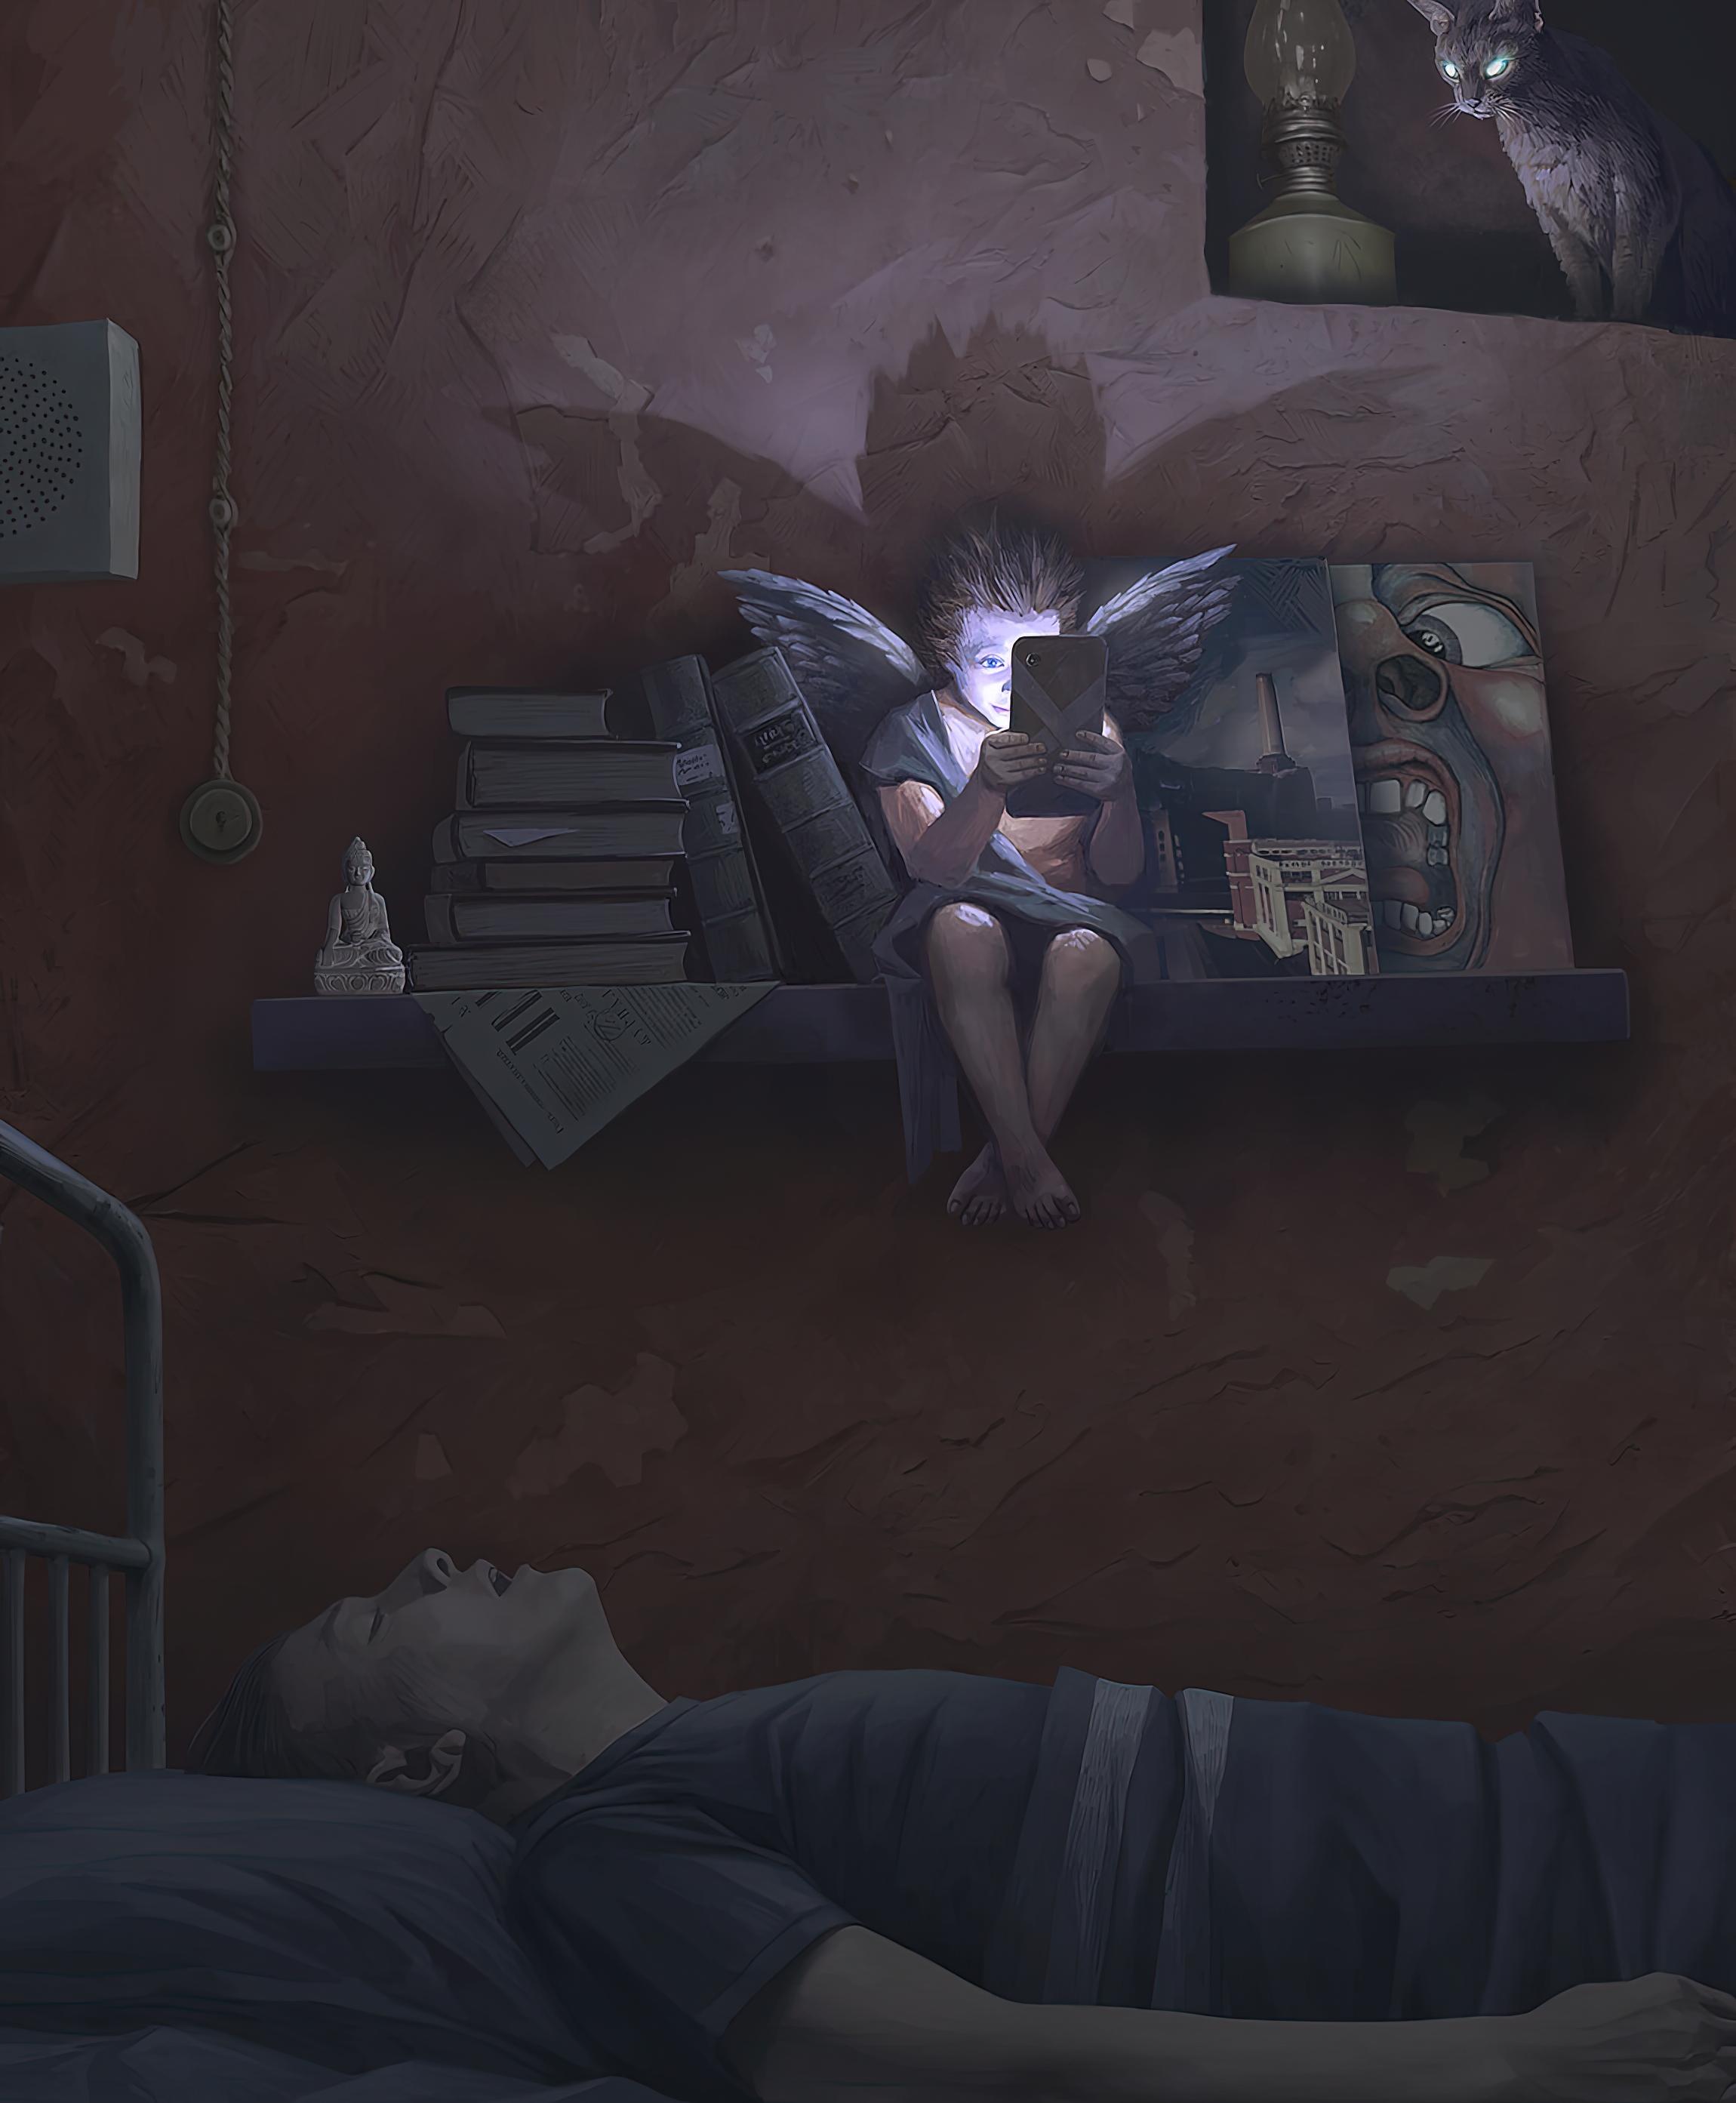 alexey-egorov-sleepless.jpg